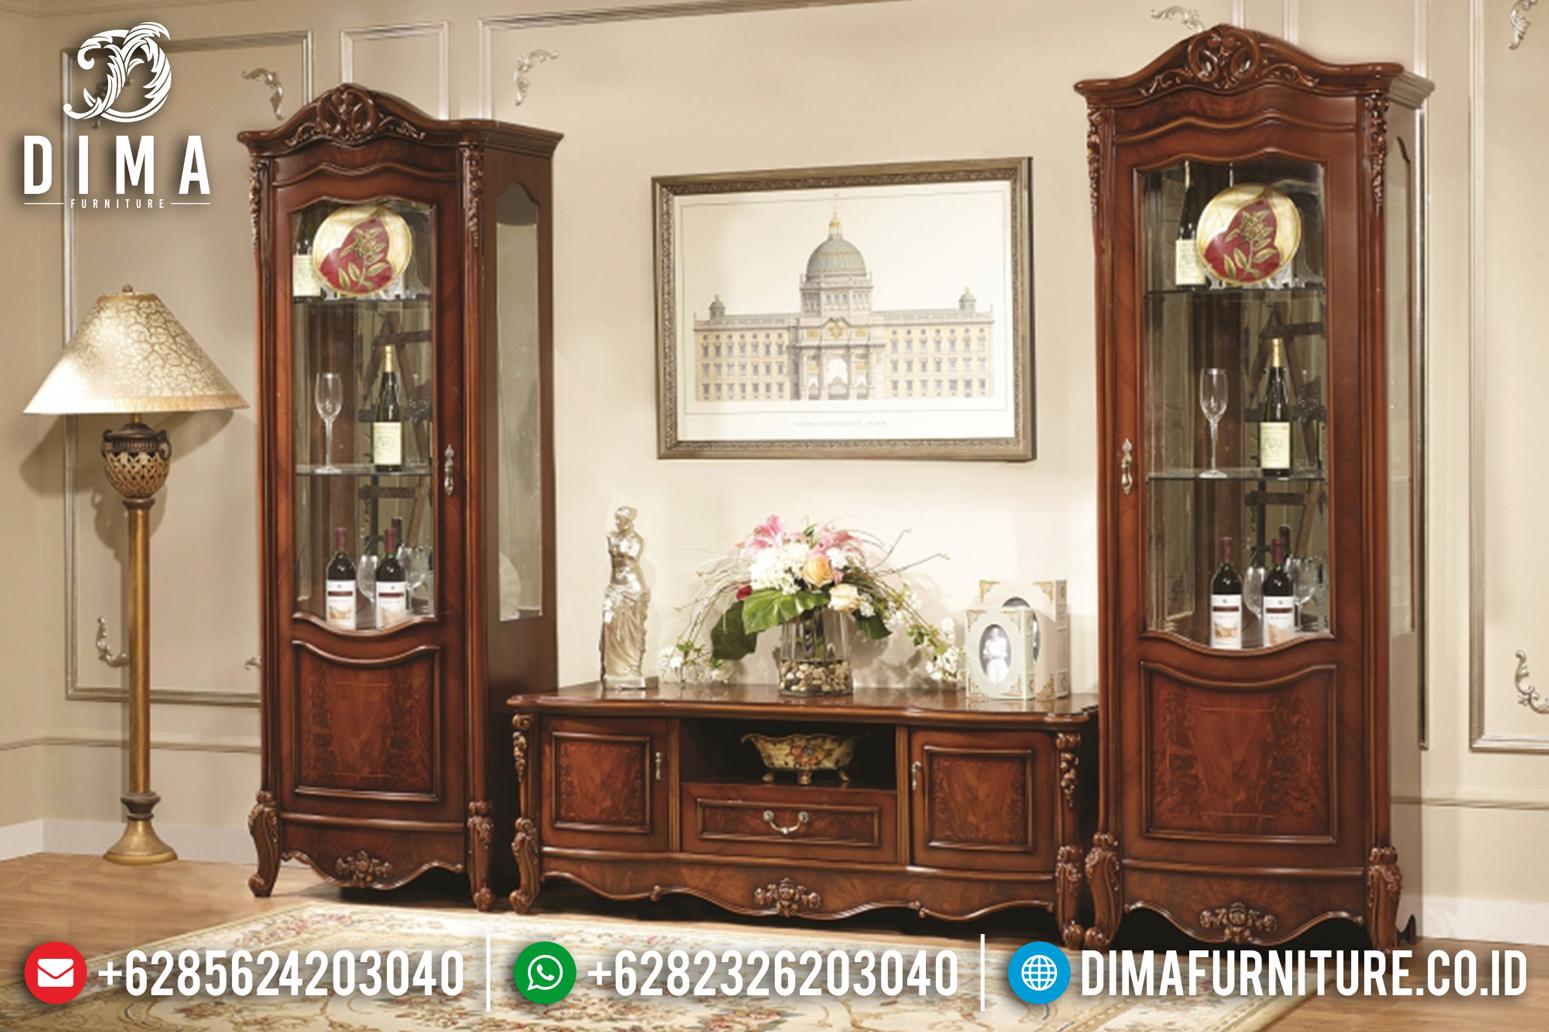 Furniture Jati Jepara Bufet TV Minimalis Mewah Terbaru Turkey DF-0675